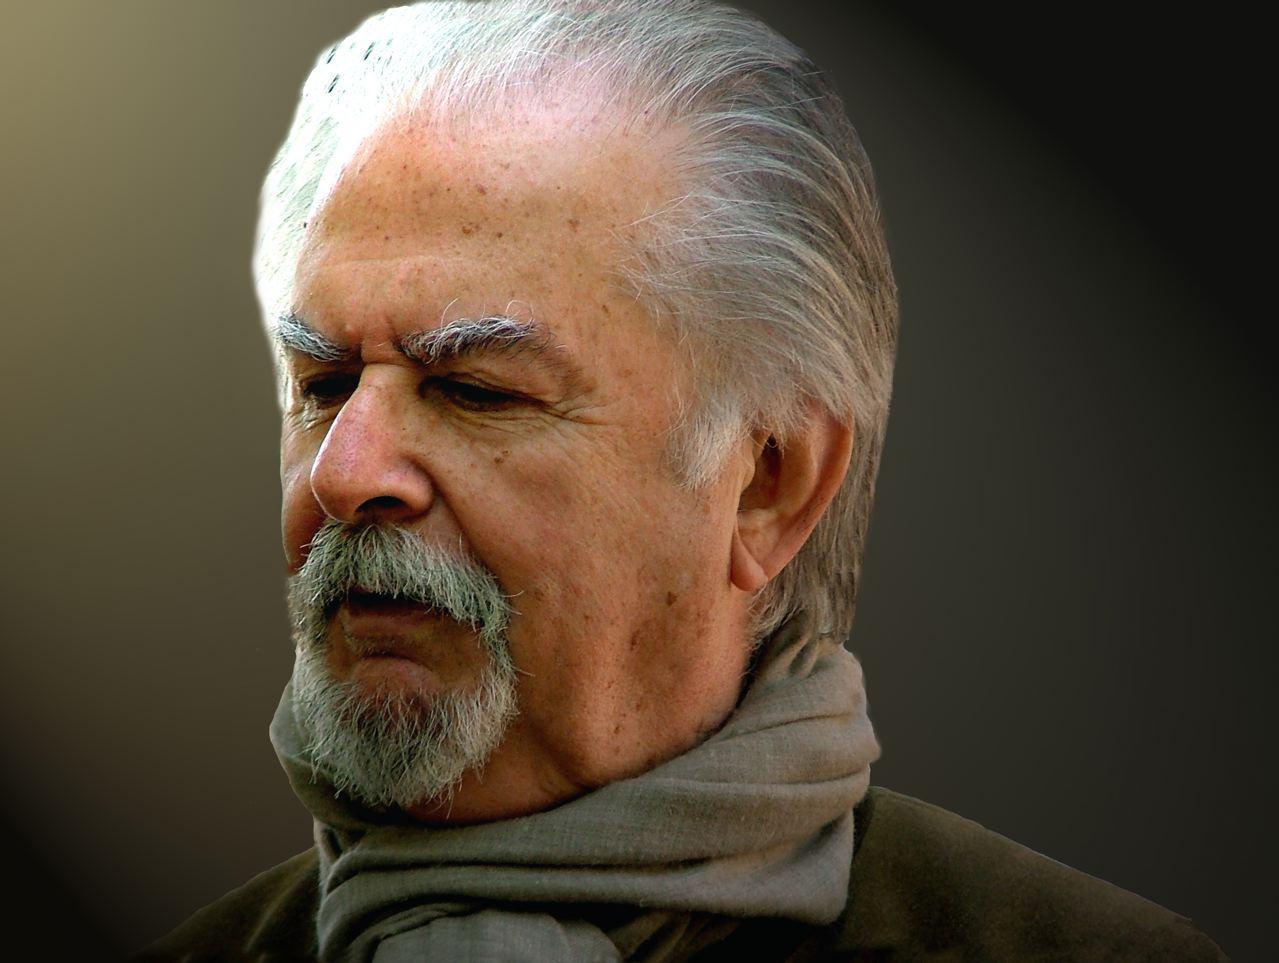 Happy 80th birthday fernando botero 80 facts about - Fotos de botero ...